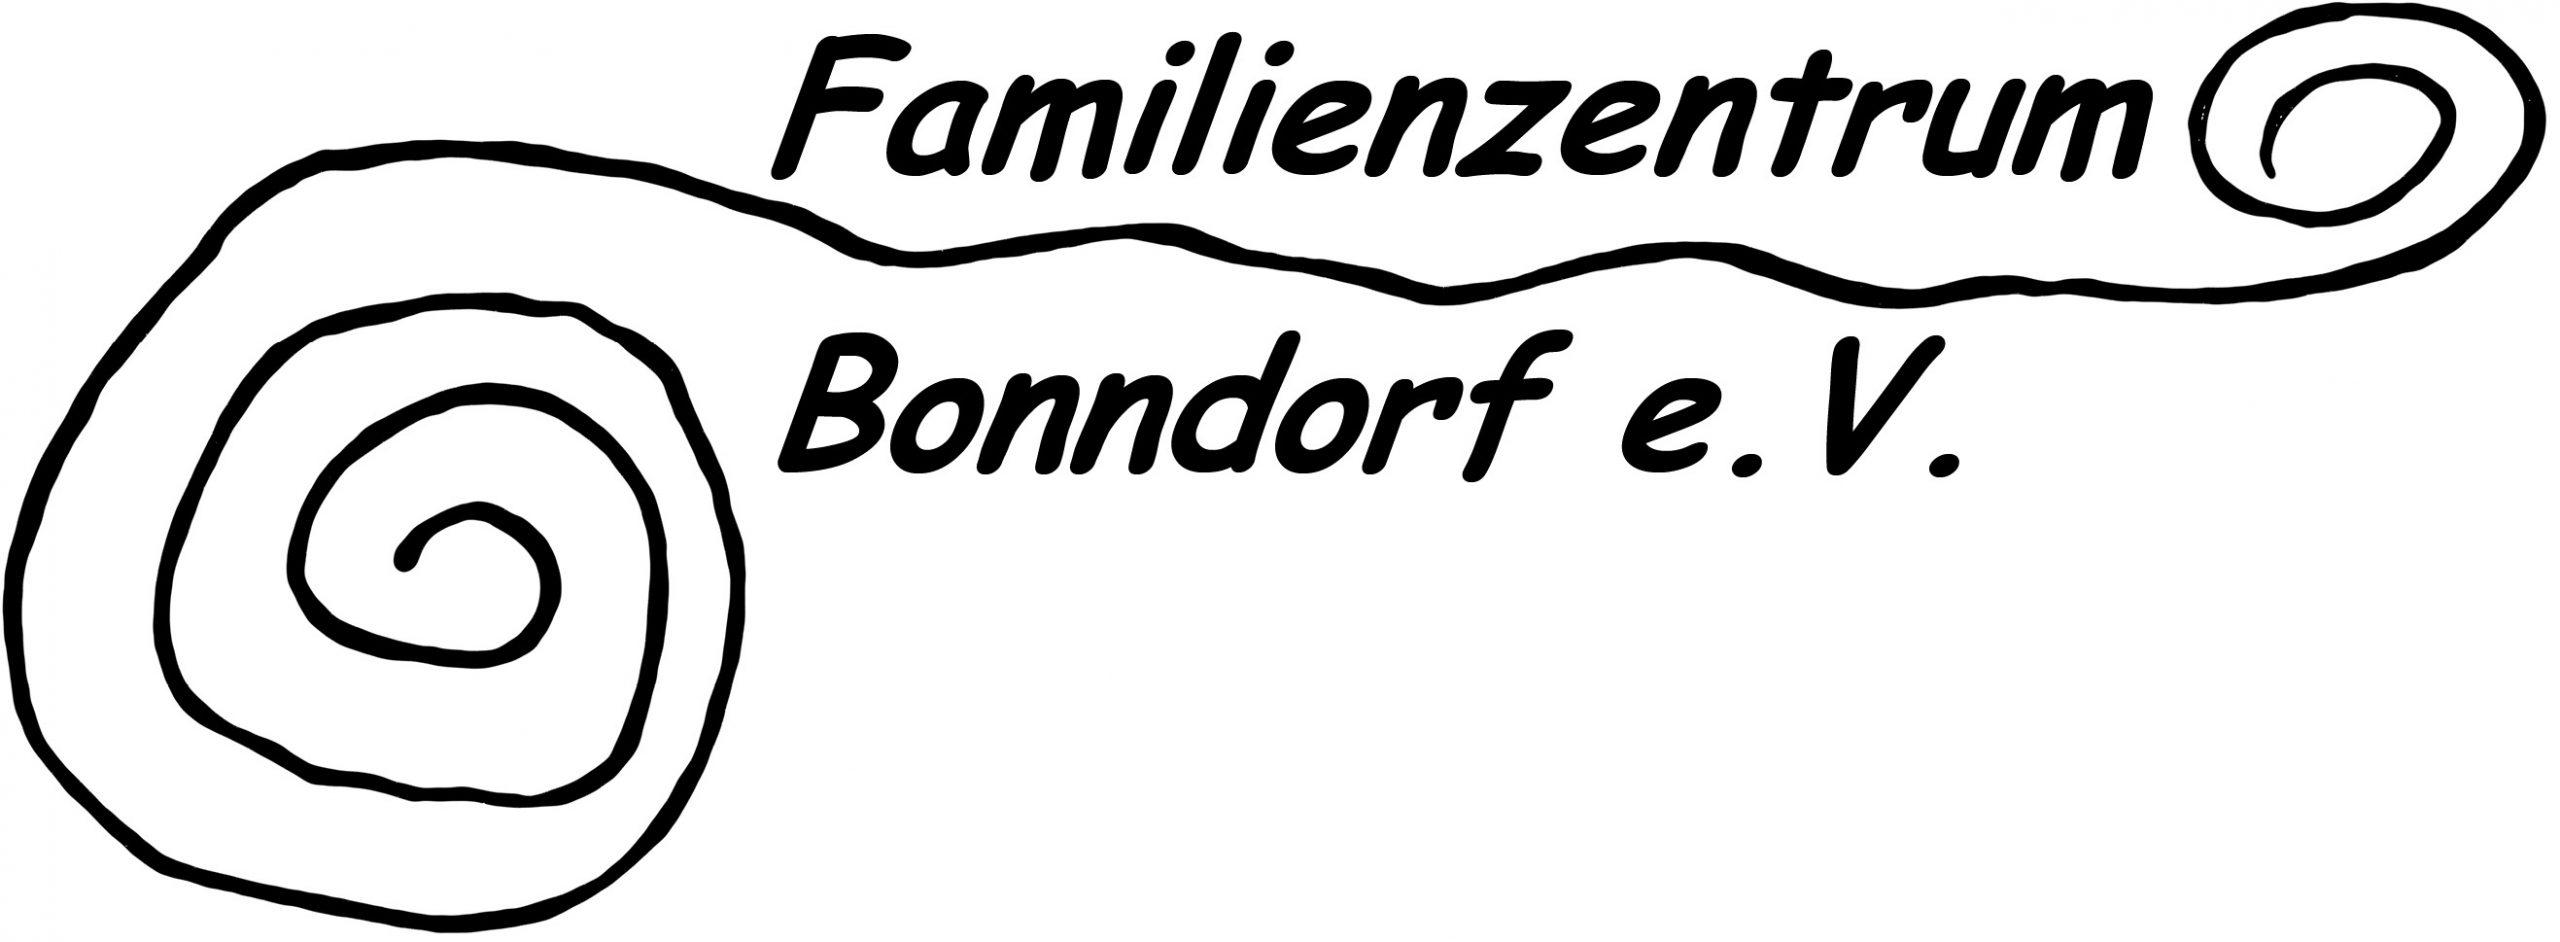 Familienzentrum Bonndorf